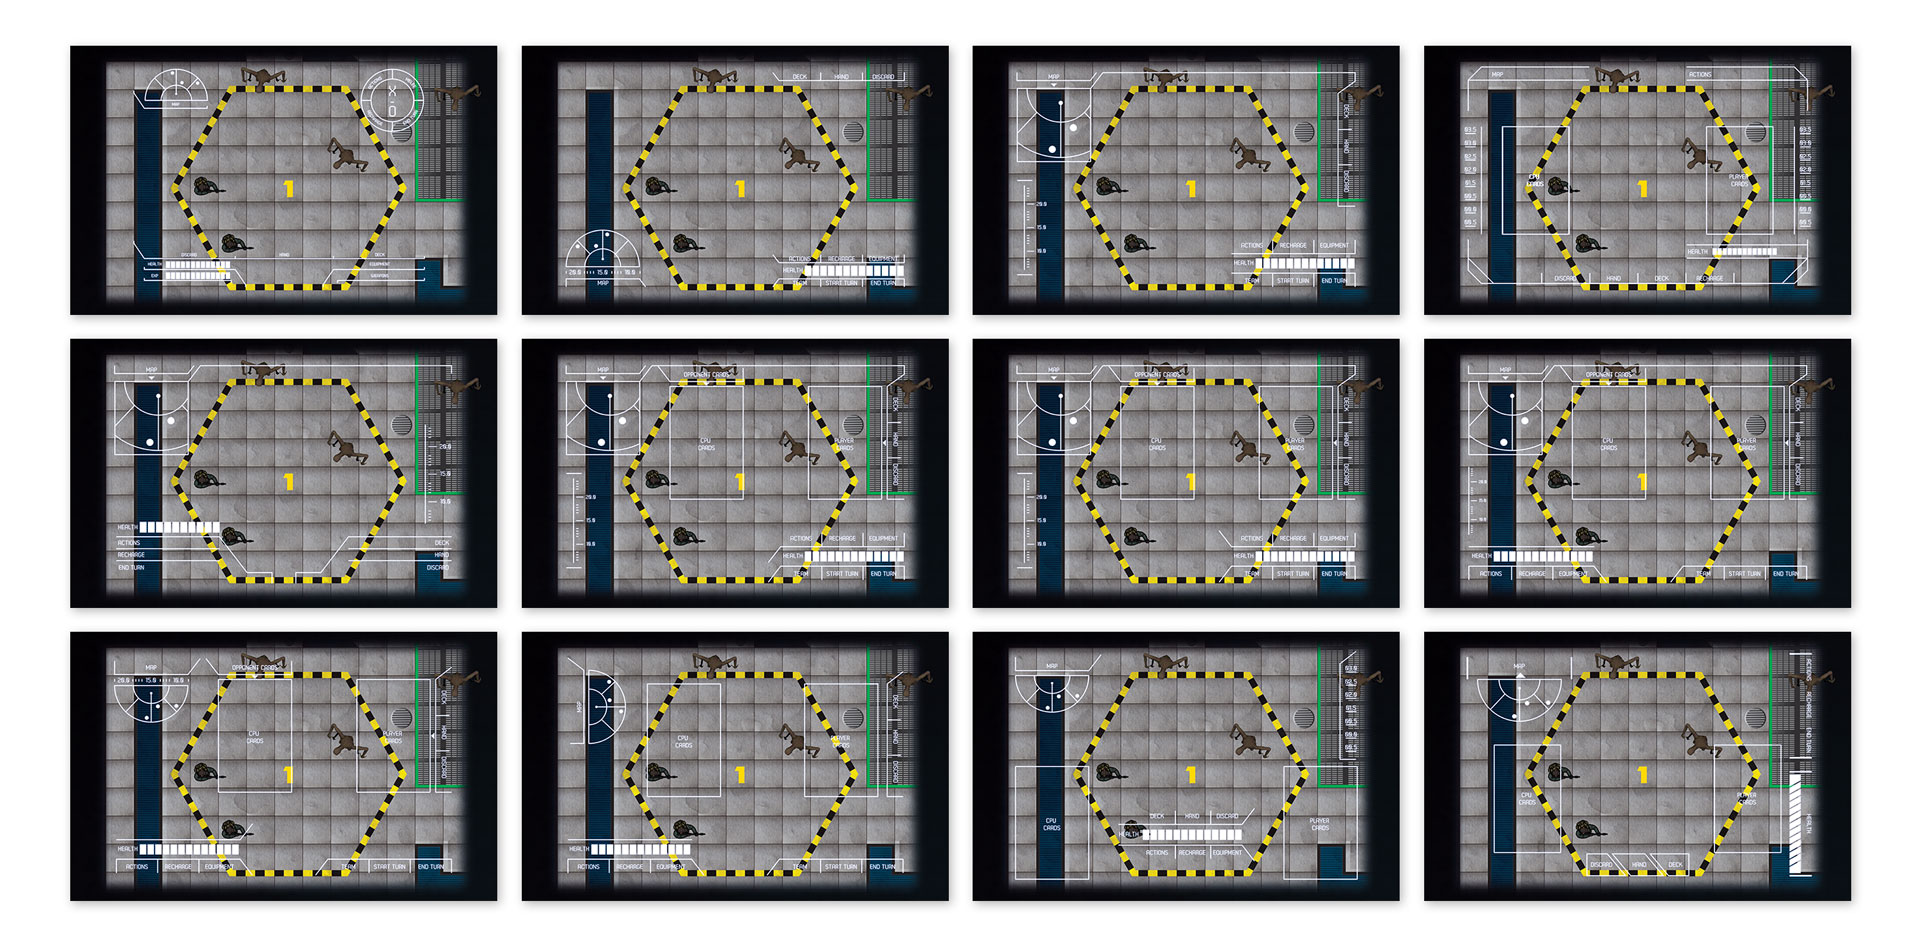 aliens-labyrinth-mobile-game-09.jpg